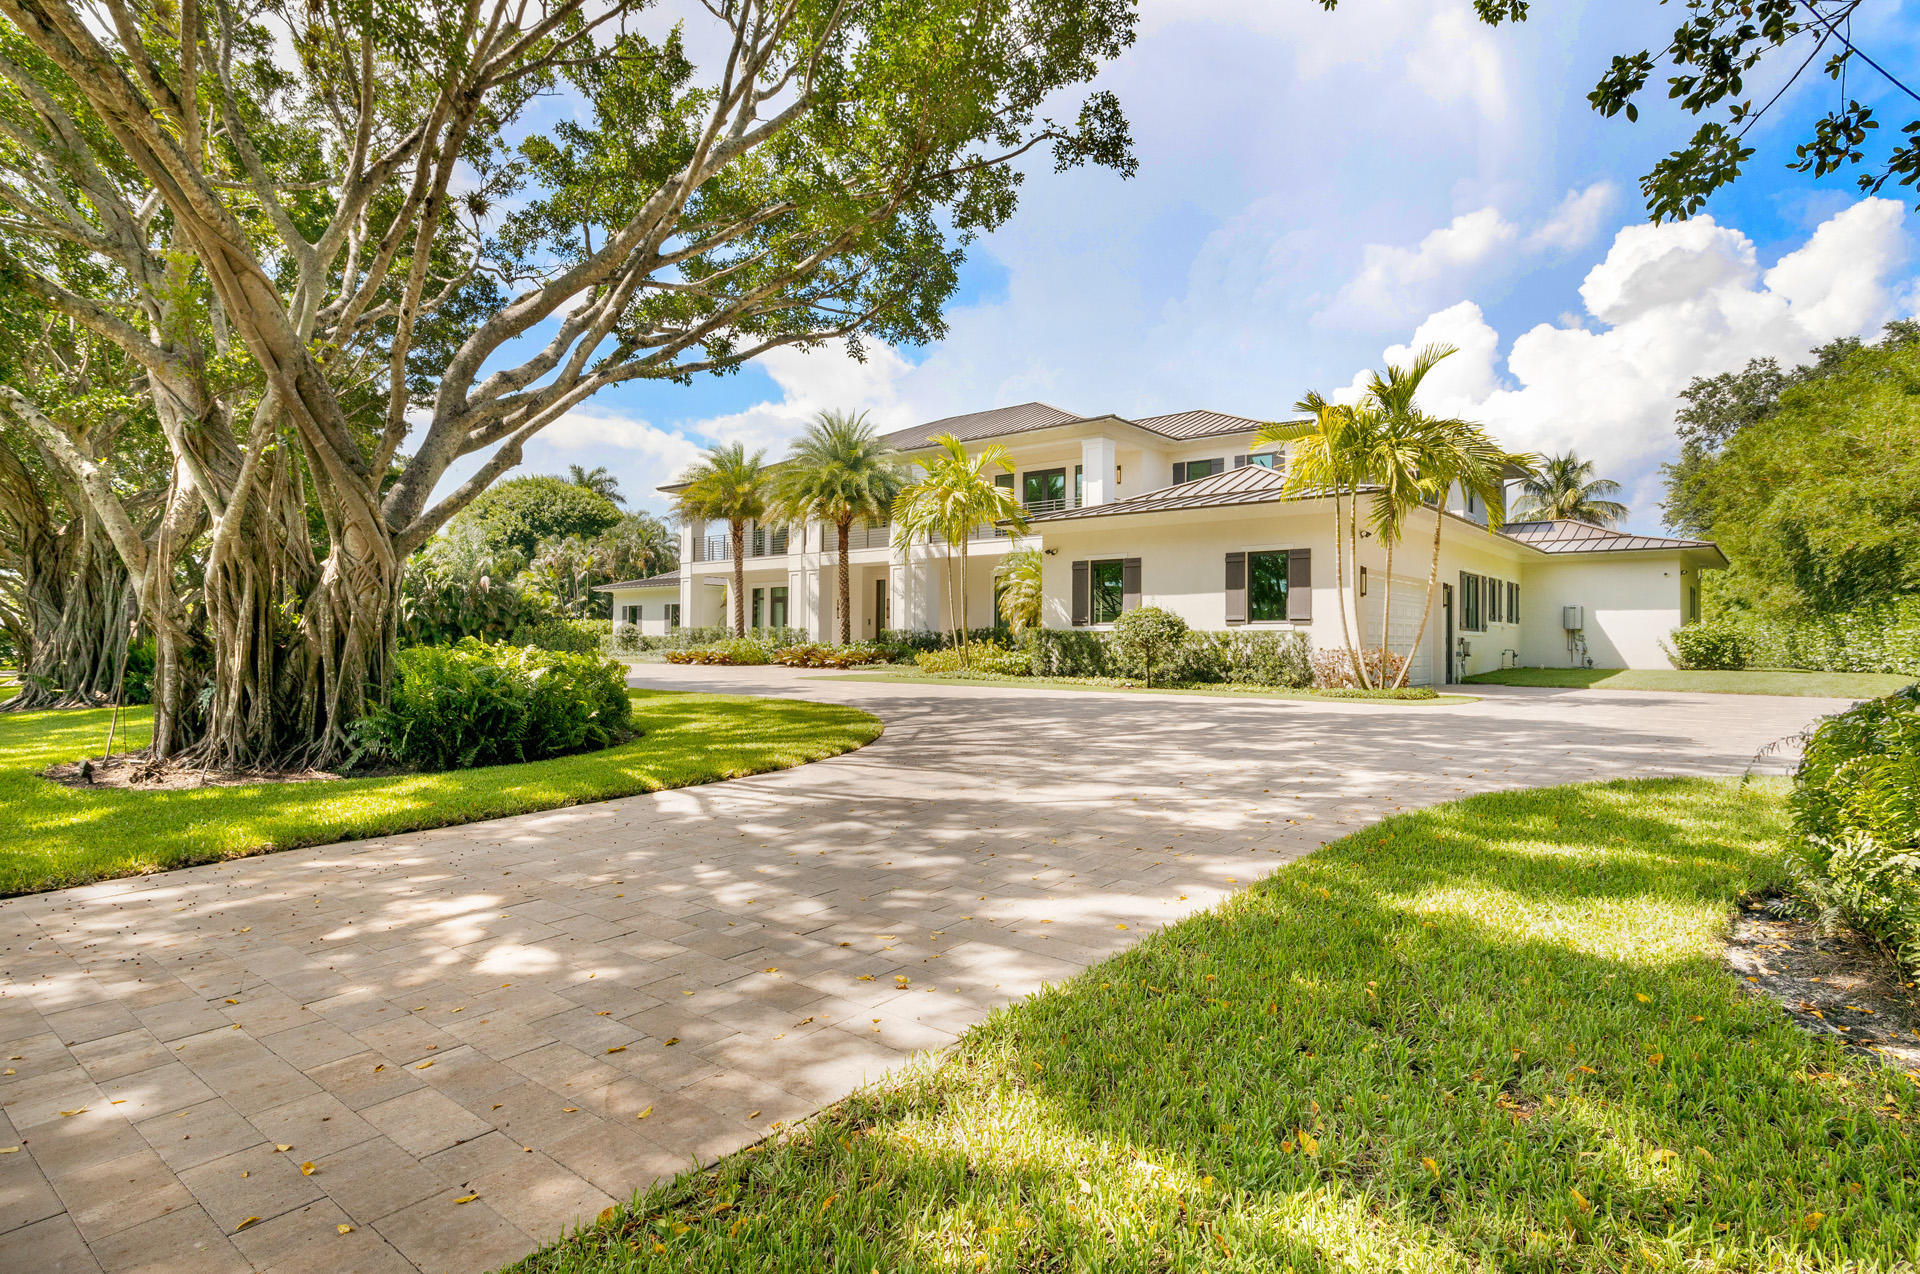 Photo of 8419 Twin Lake Drive, Boca Raton, FL 33496